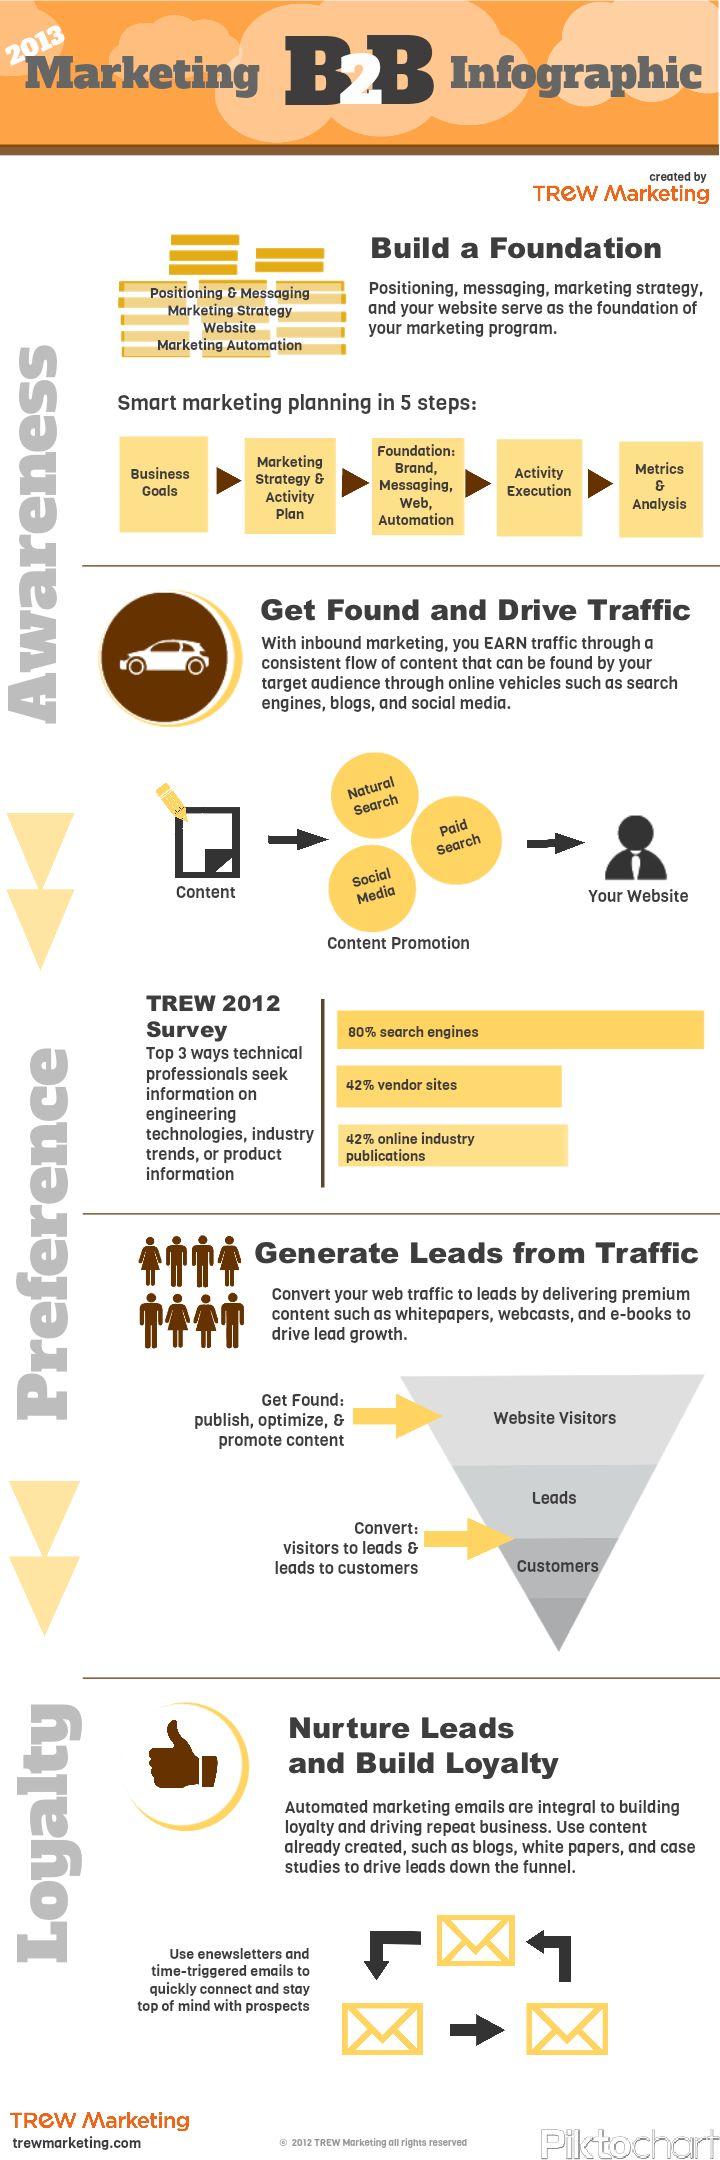 Cool B2B Marketing Infographic #infographic #B2BMarketing #contentmarketing